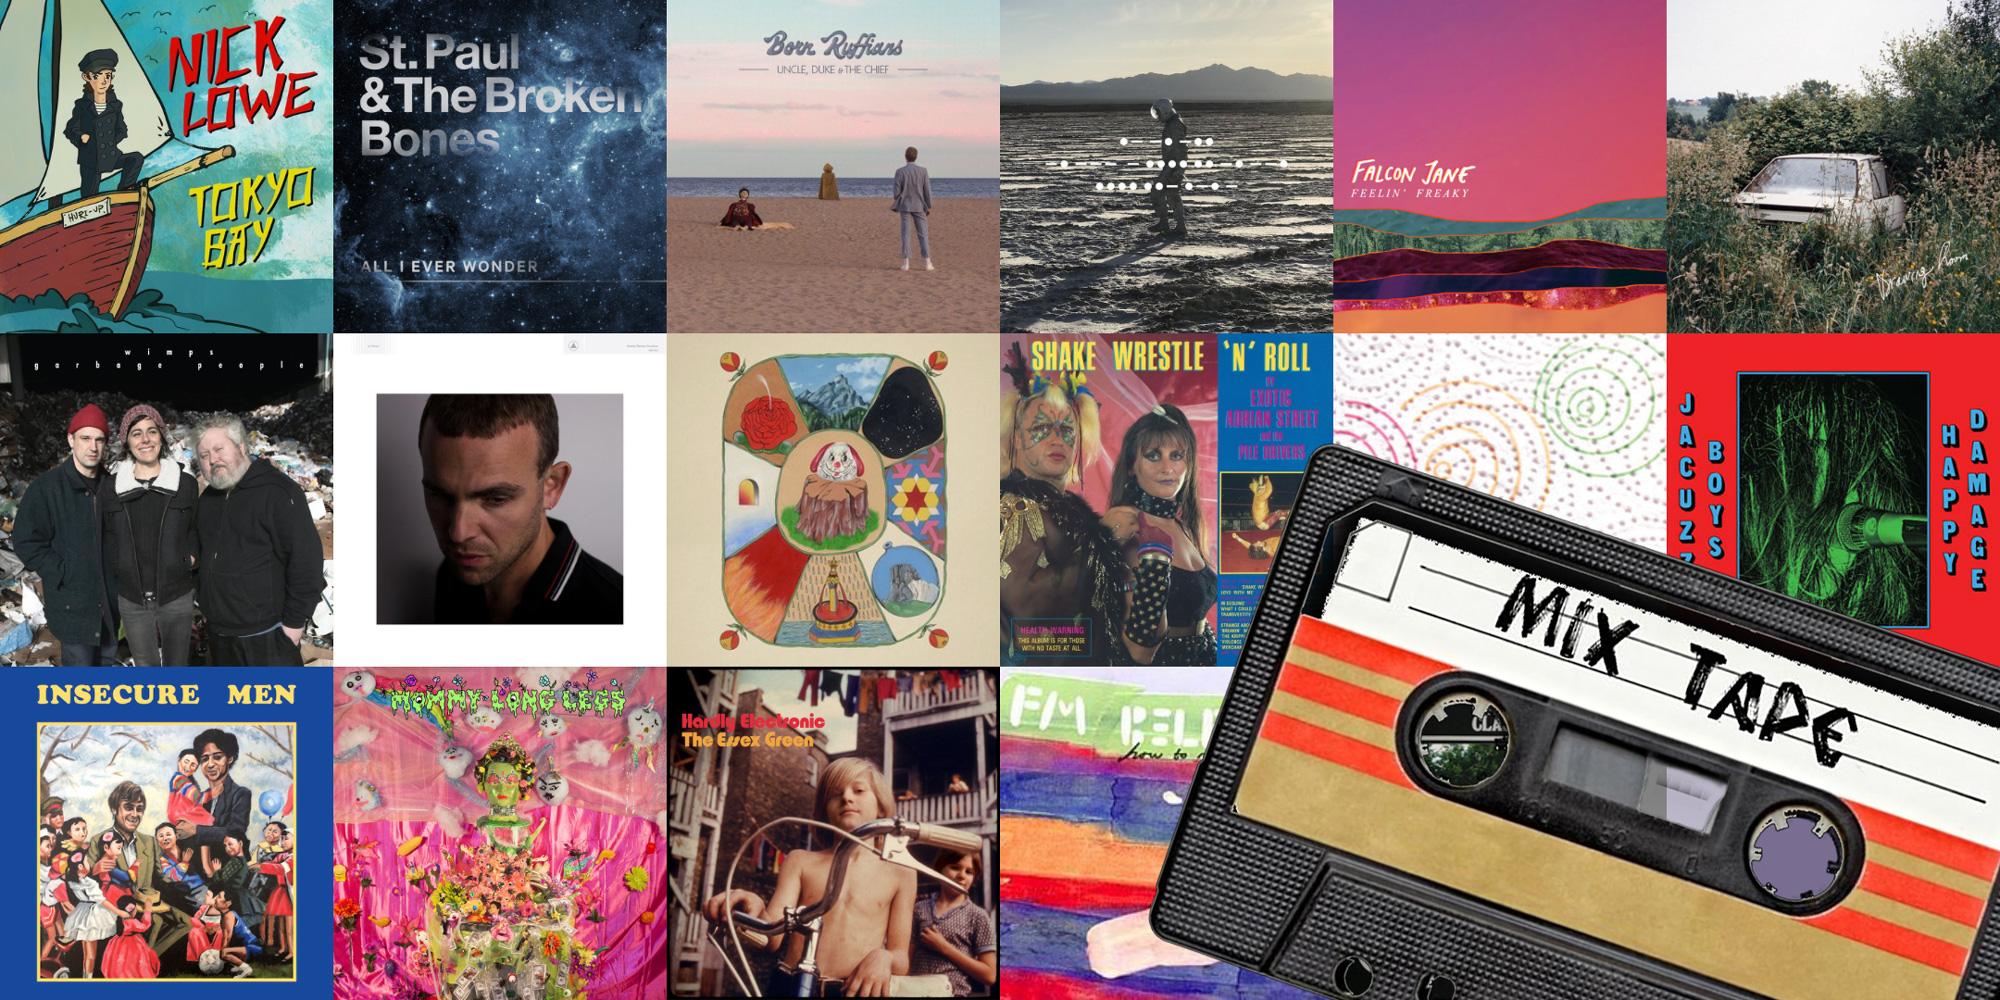 Elan's September 2018 Mixtape album covers